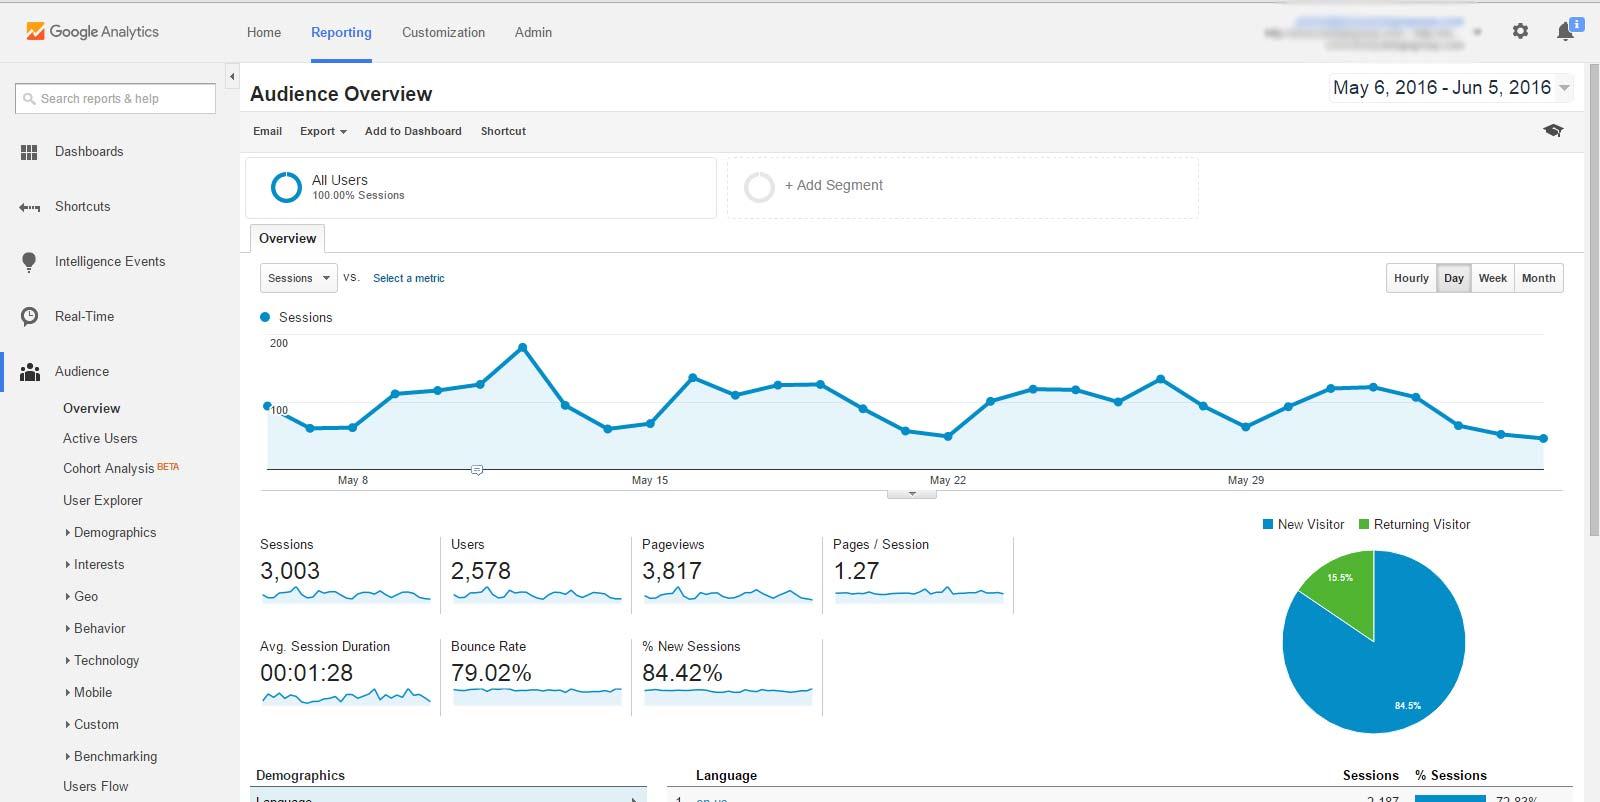 Google Analytics - Event Marketing Tools